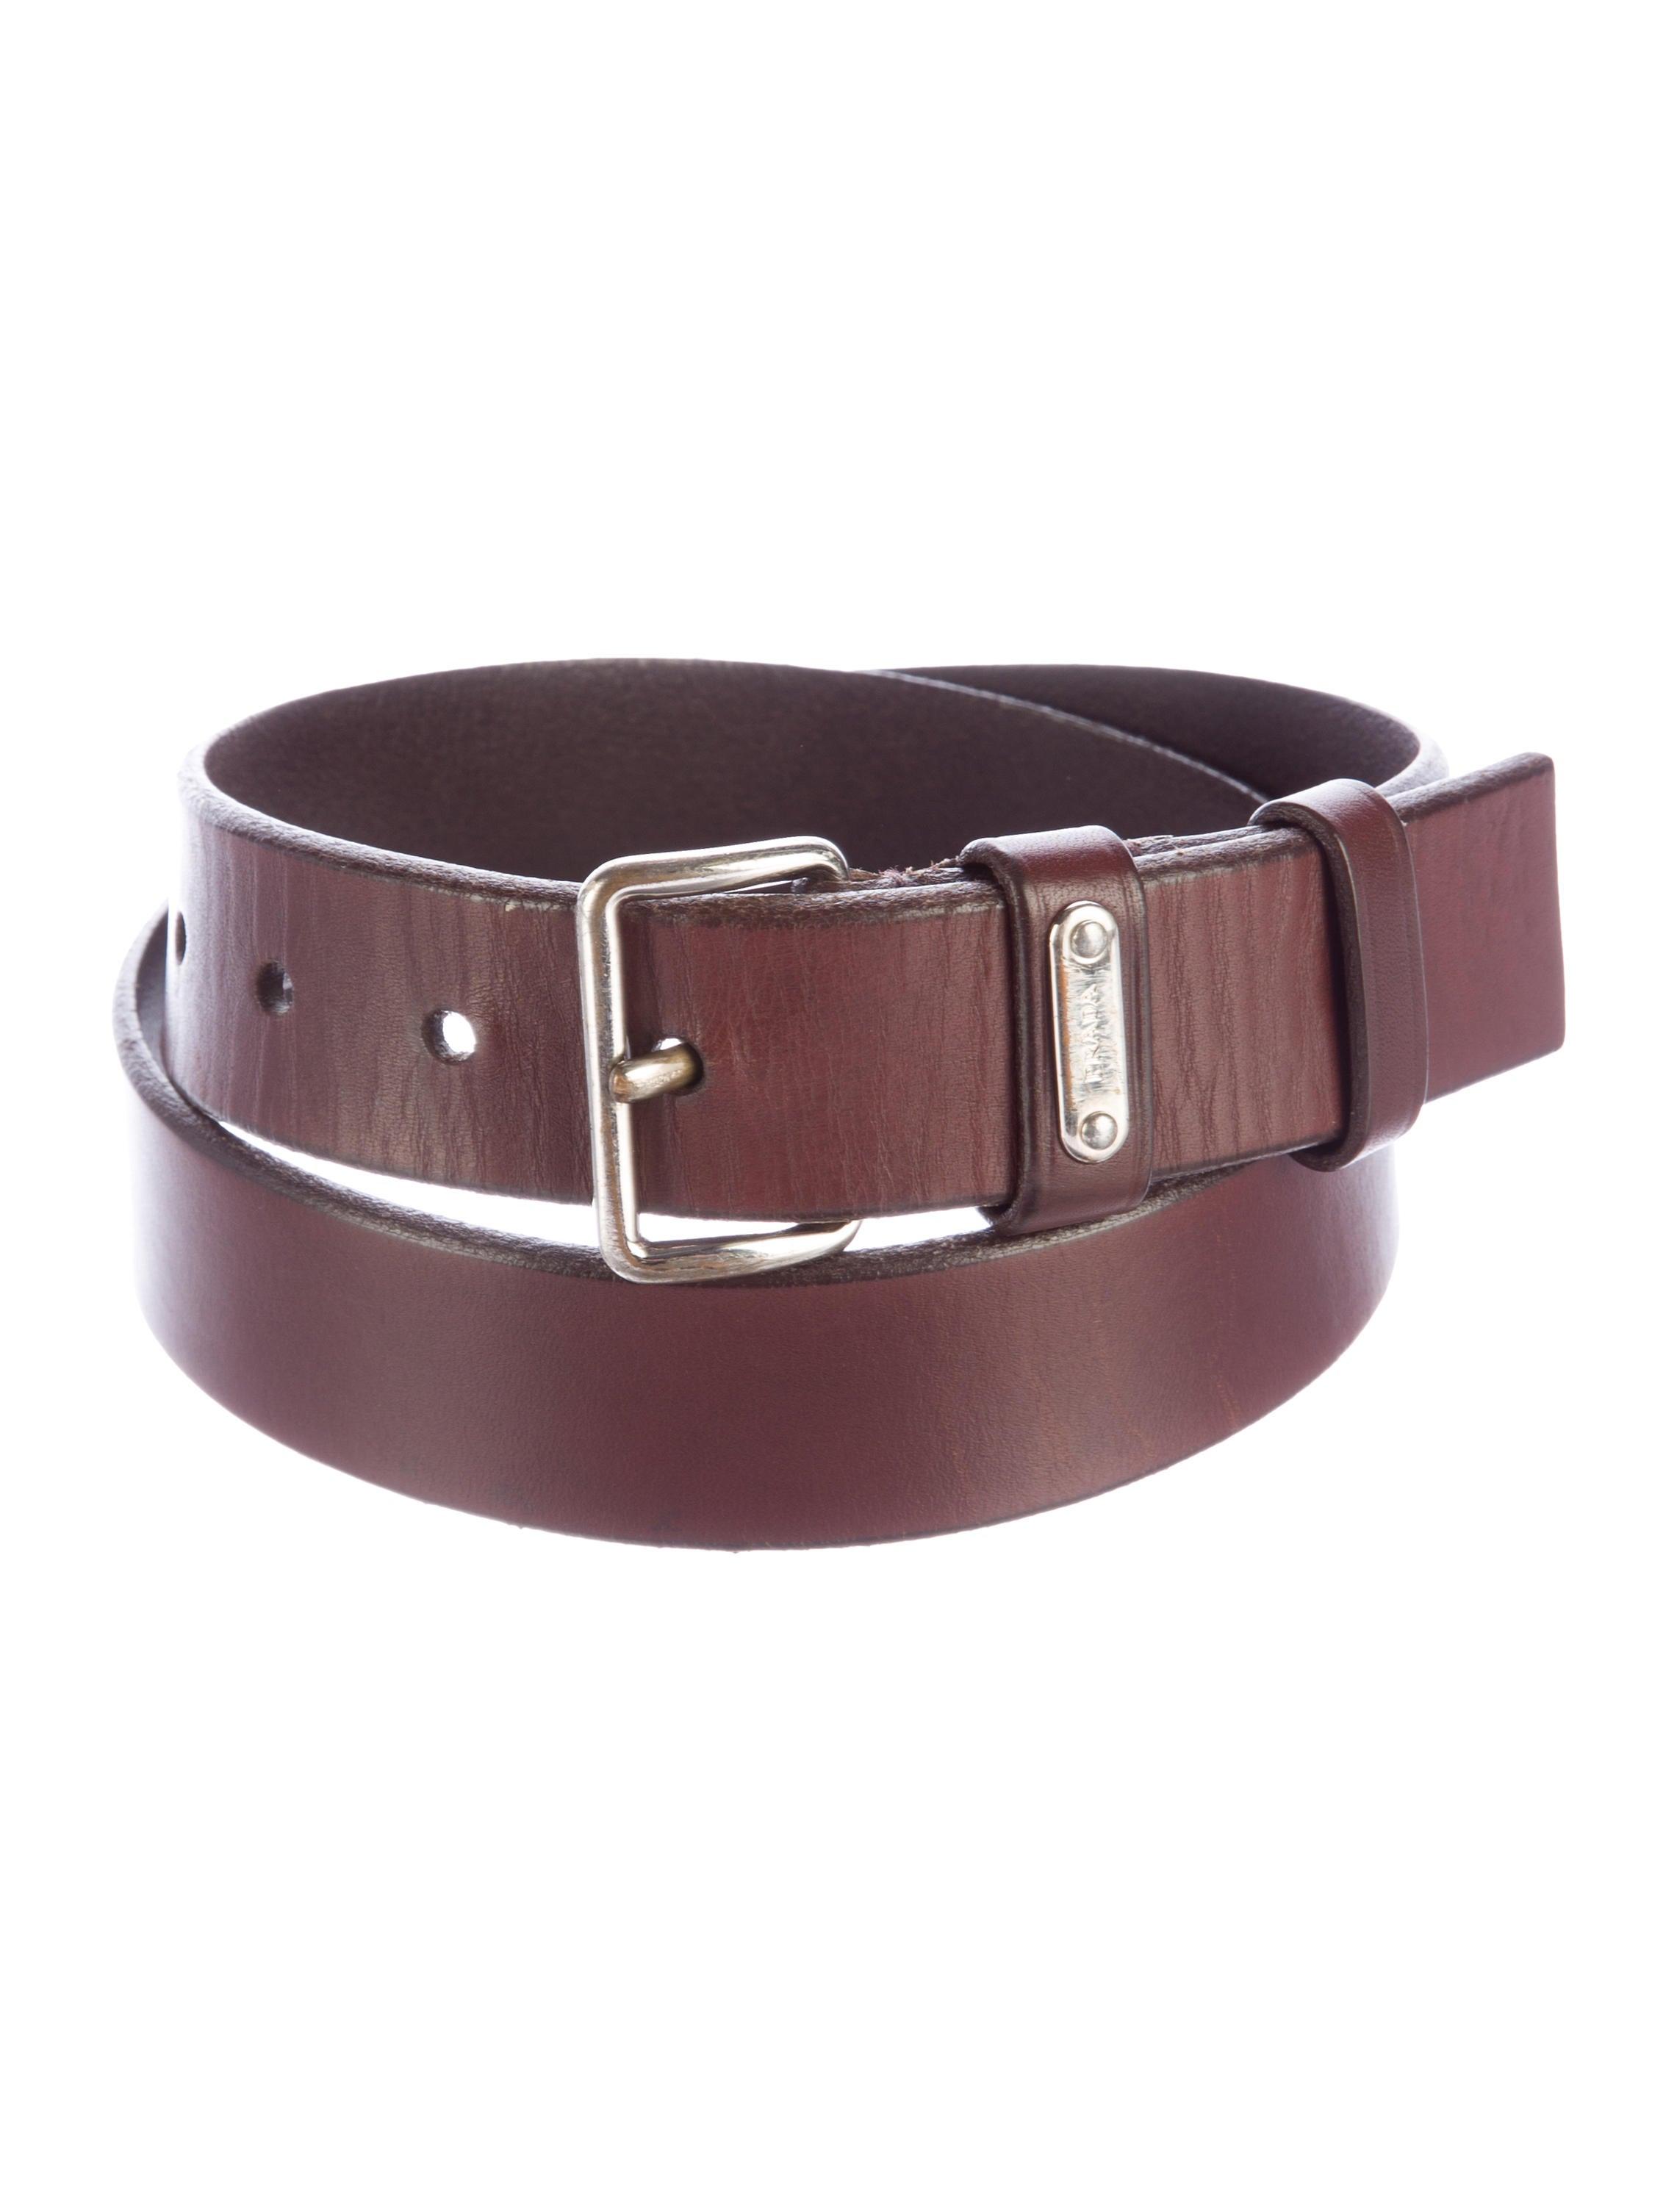 prada leather dress belt accessories pra133549 the